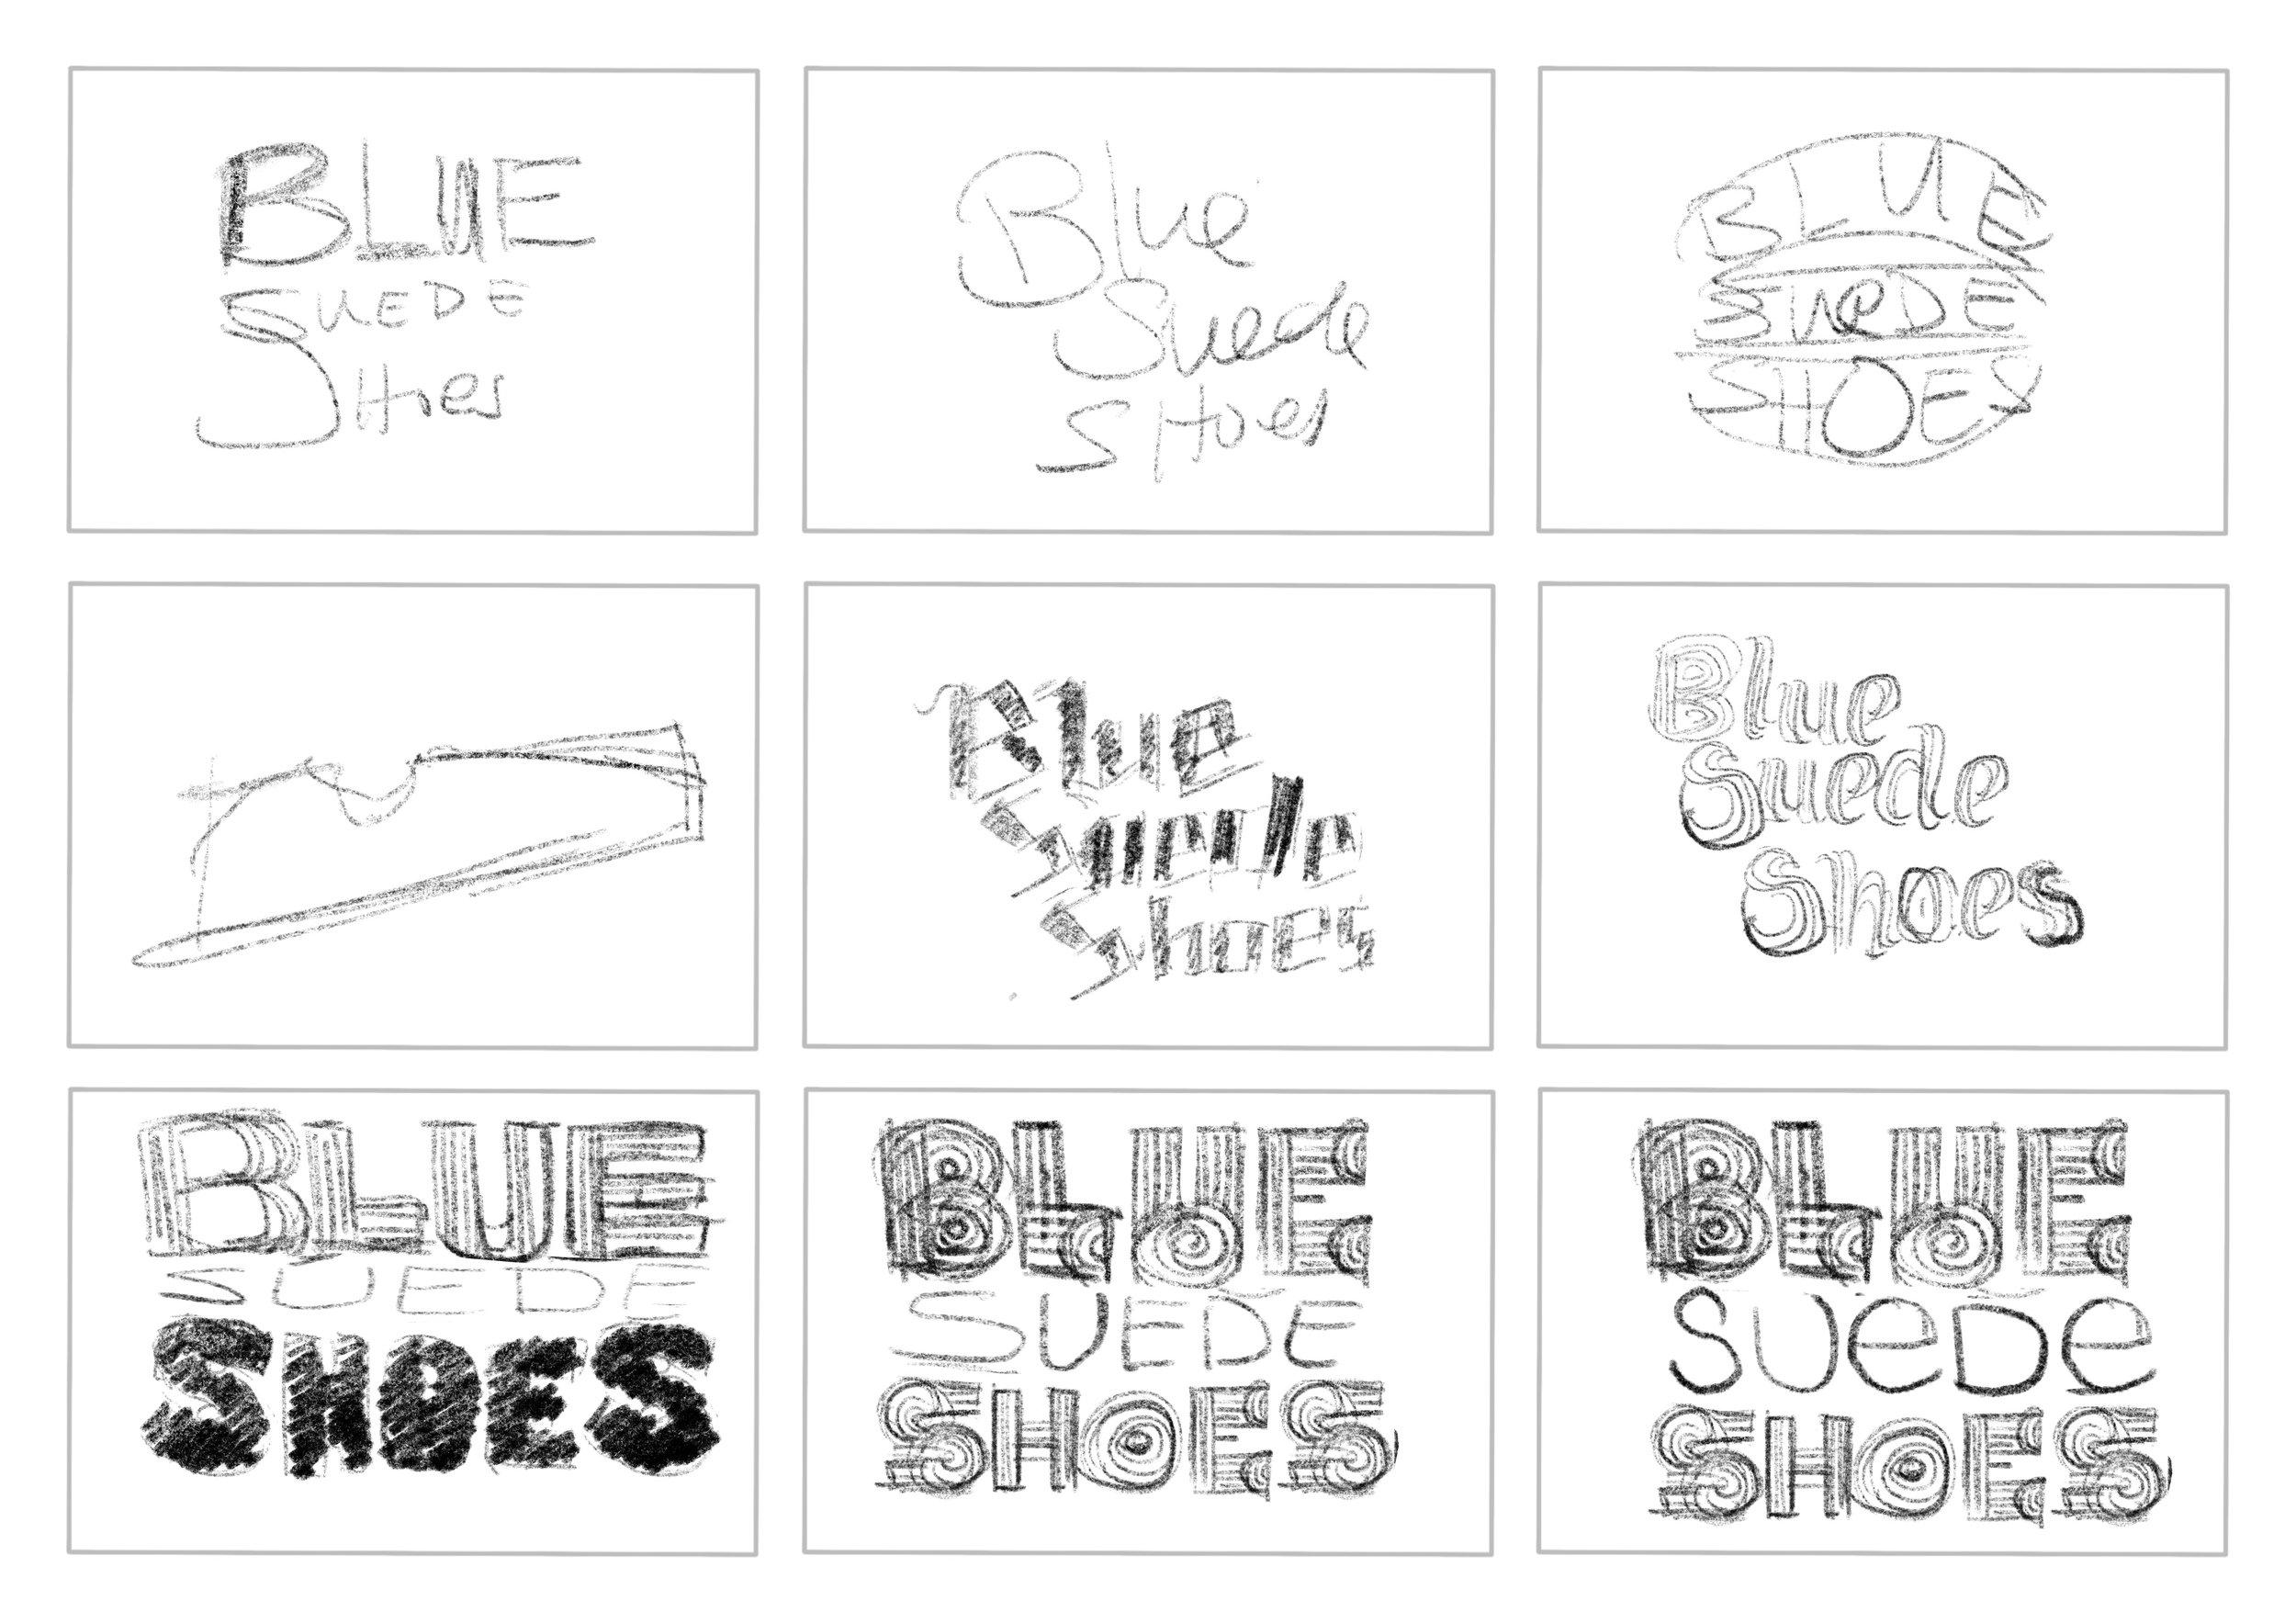 Blue_Suede_Shoes.jpg